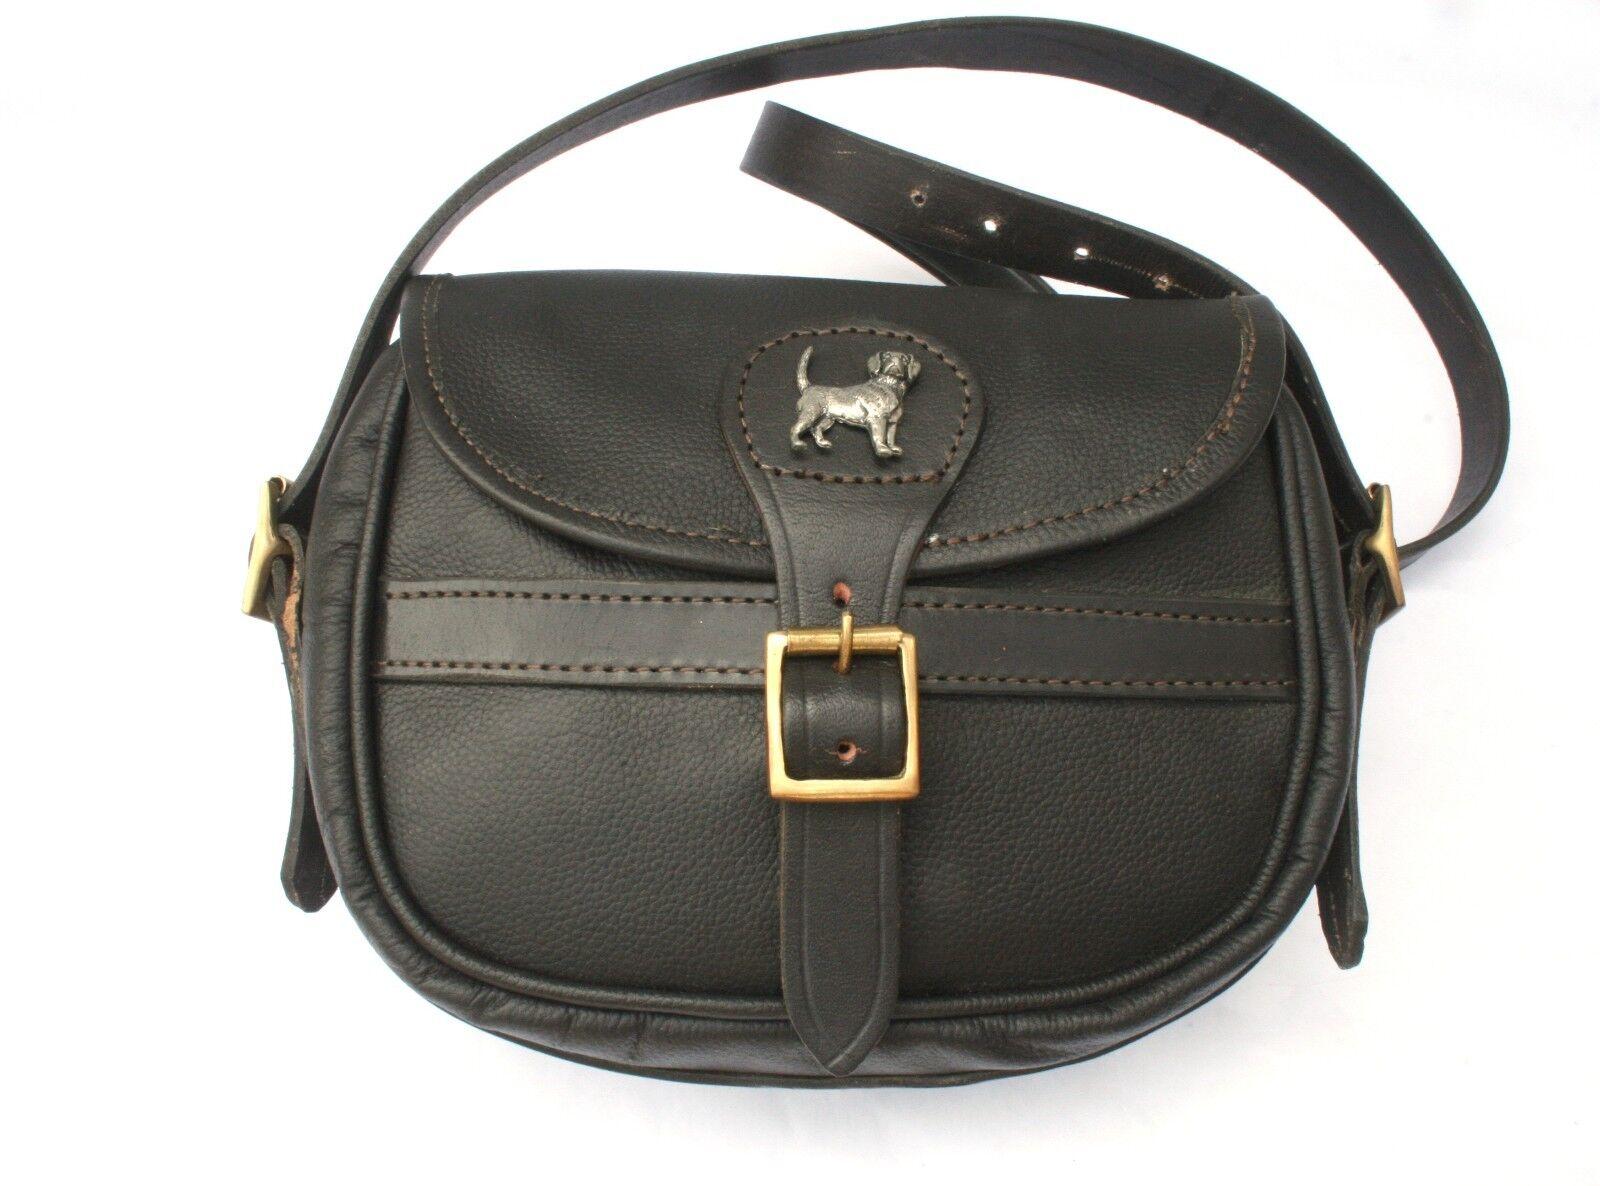 Beagle Dog Leather Shooting Cartridge Bag 75 Capacity Hunting Gift